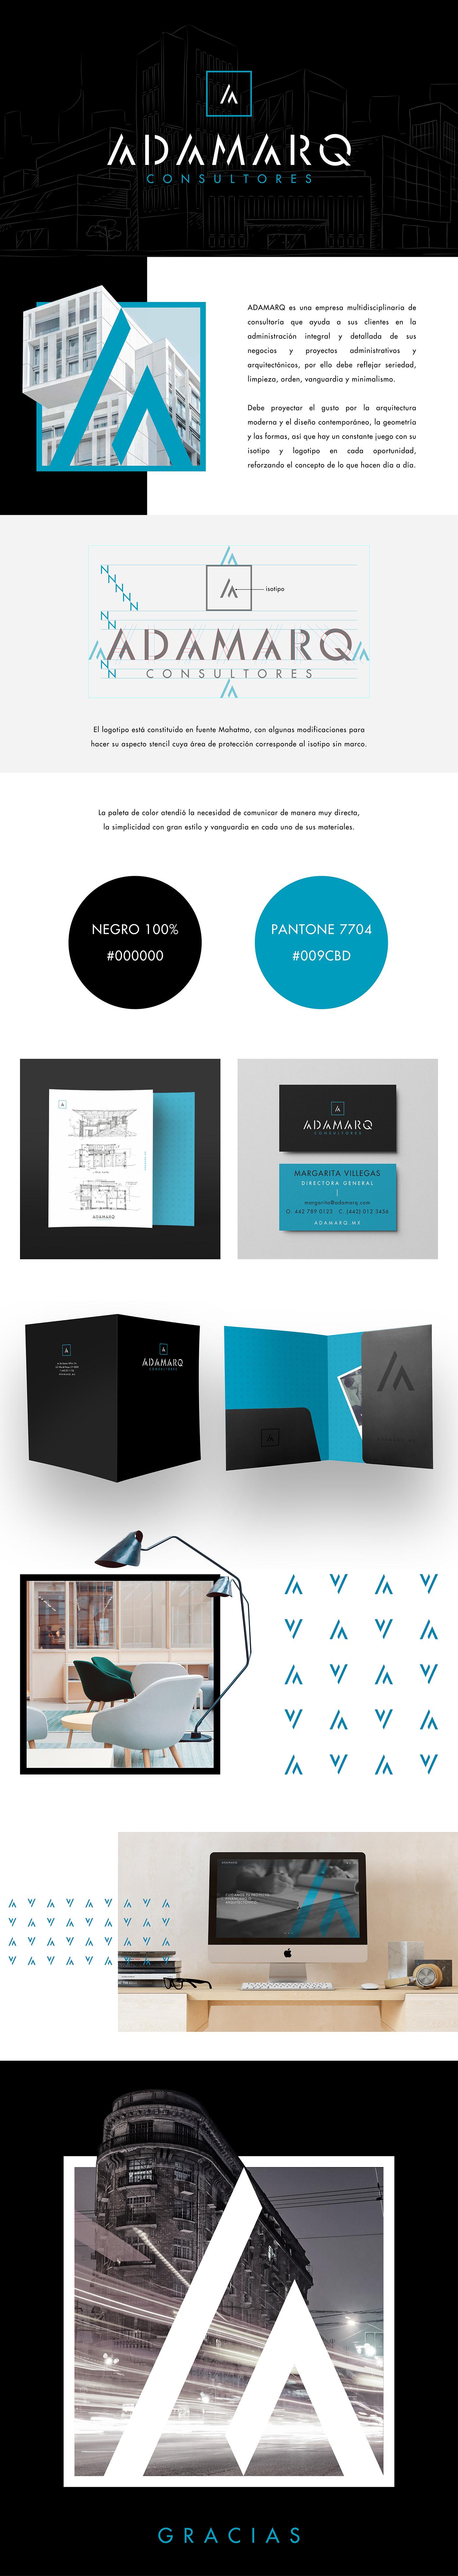 architecture brand identity branding  design logo Logotipo Logotype visual identity